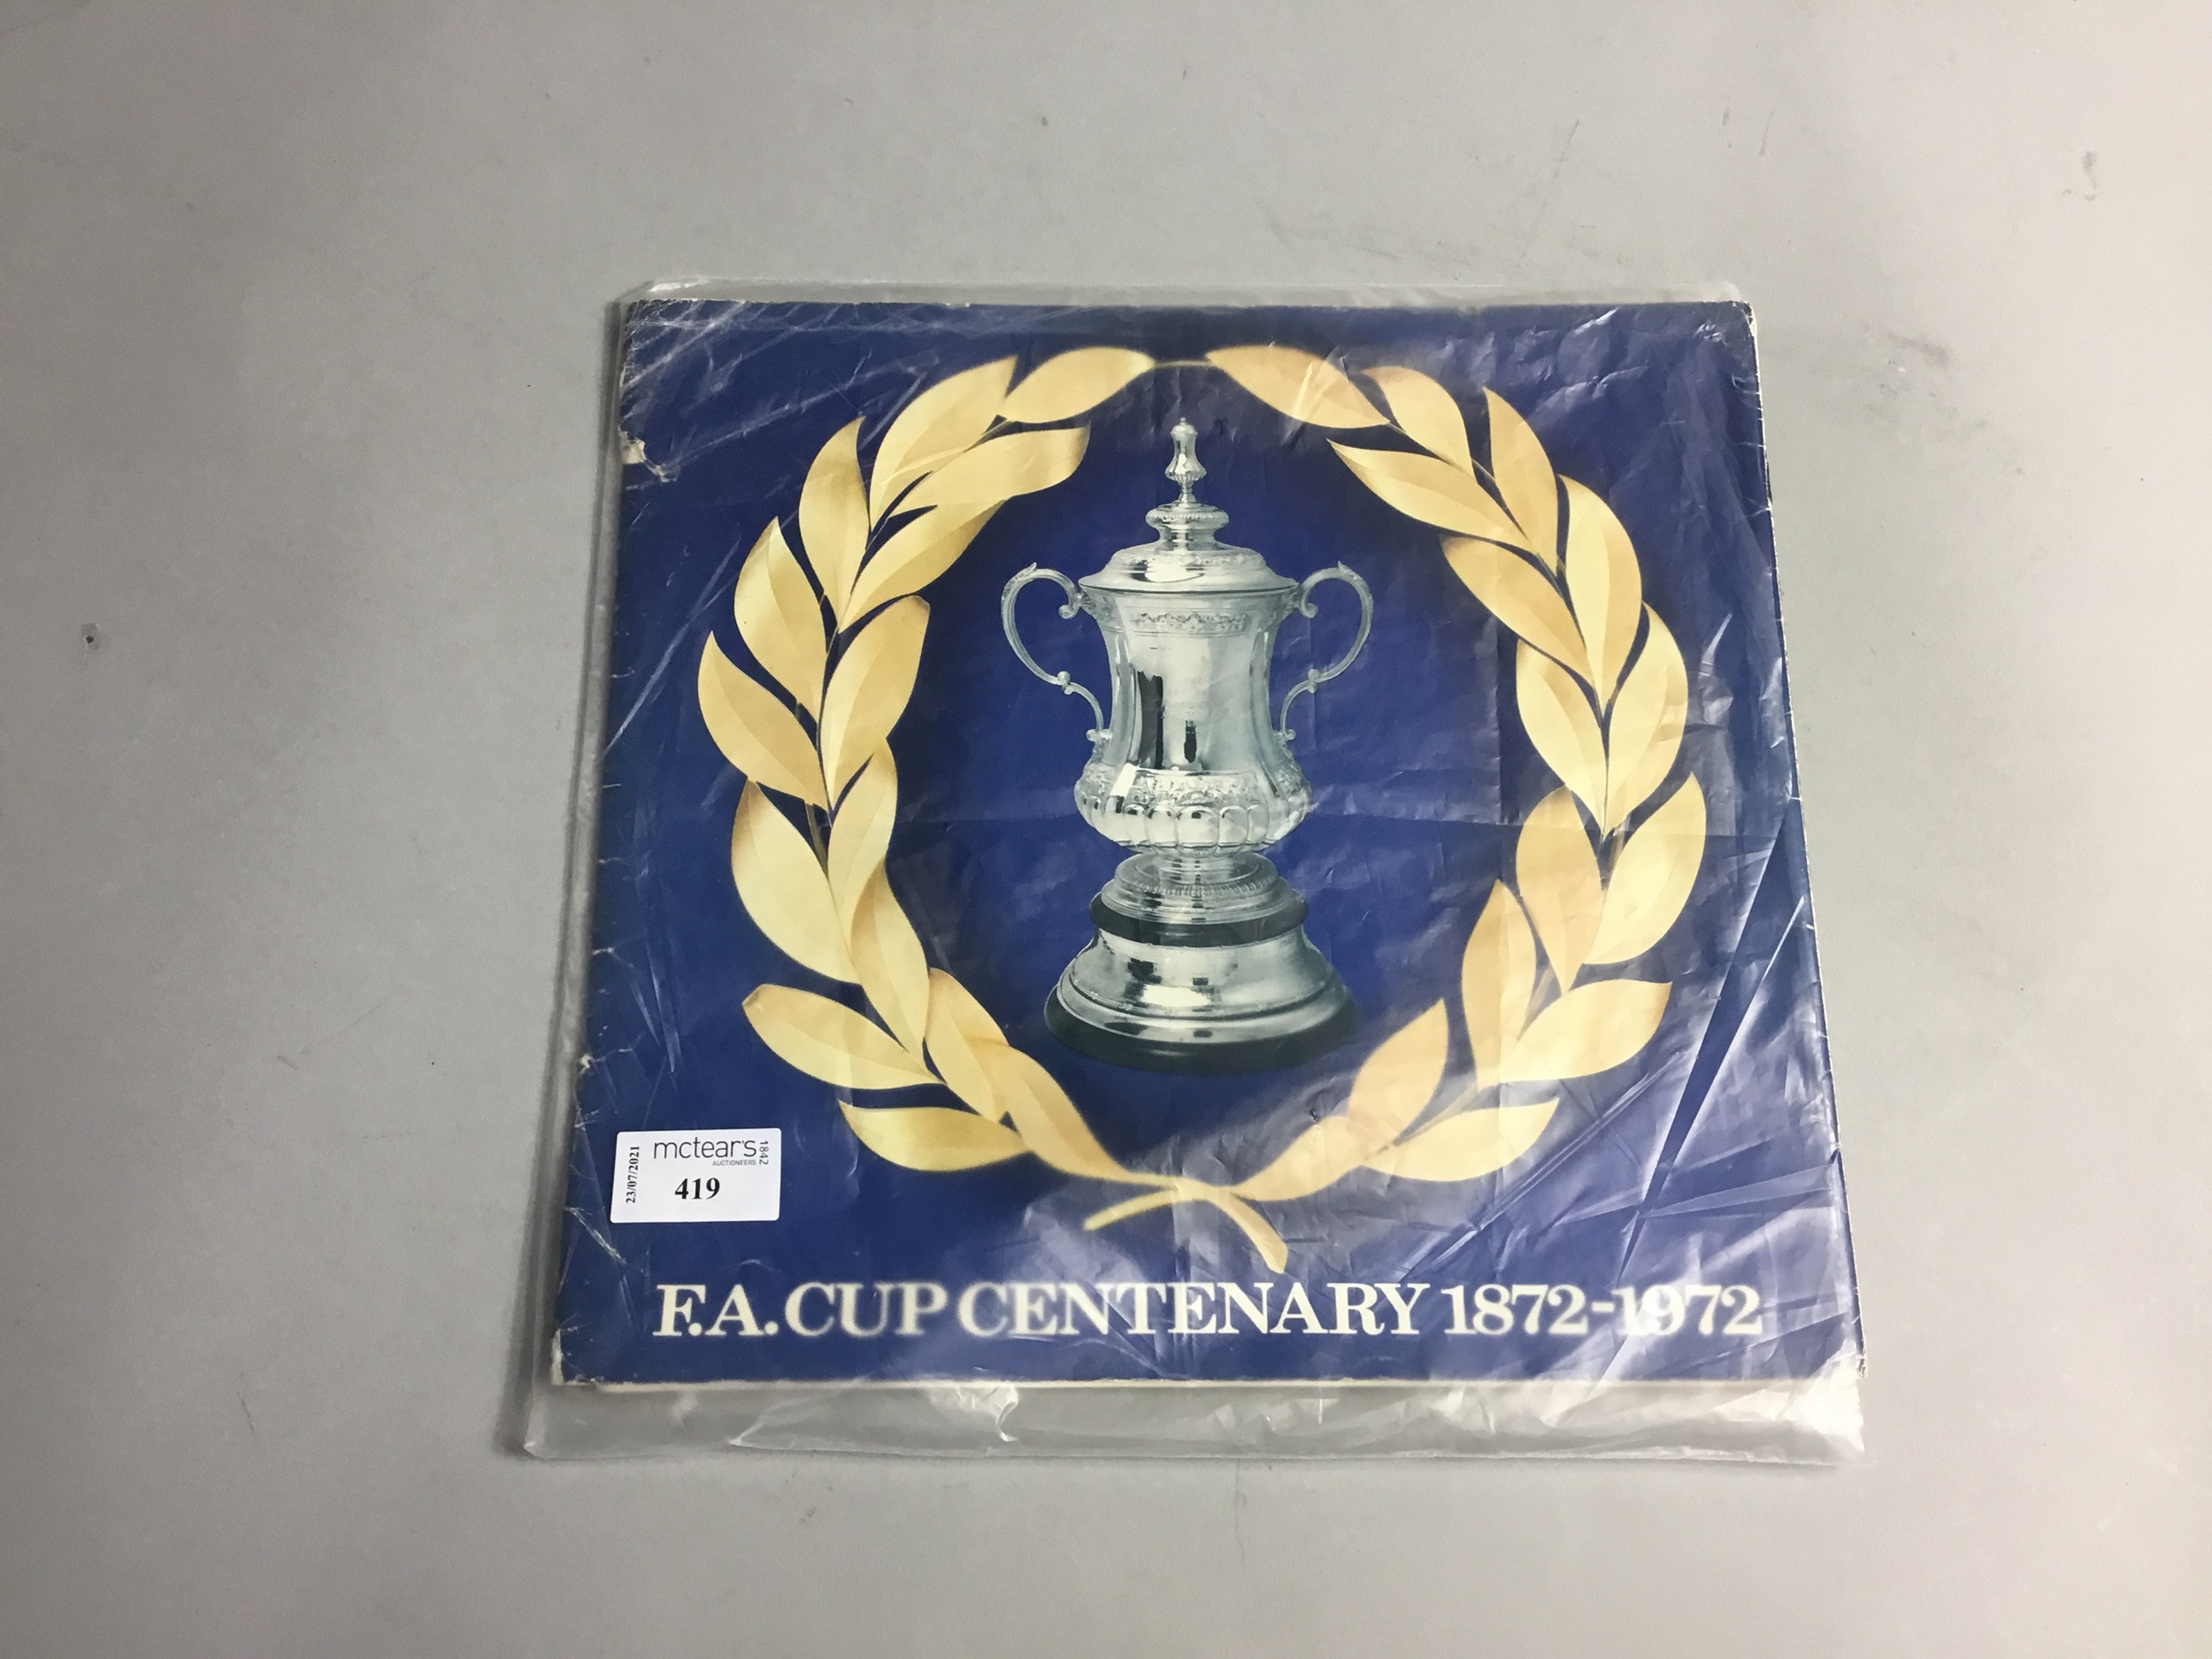 AN F.A CUP CENTENARY 1872-1972 MEDALS PRESENTATION SET